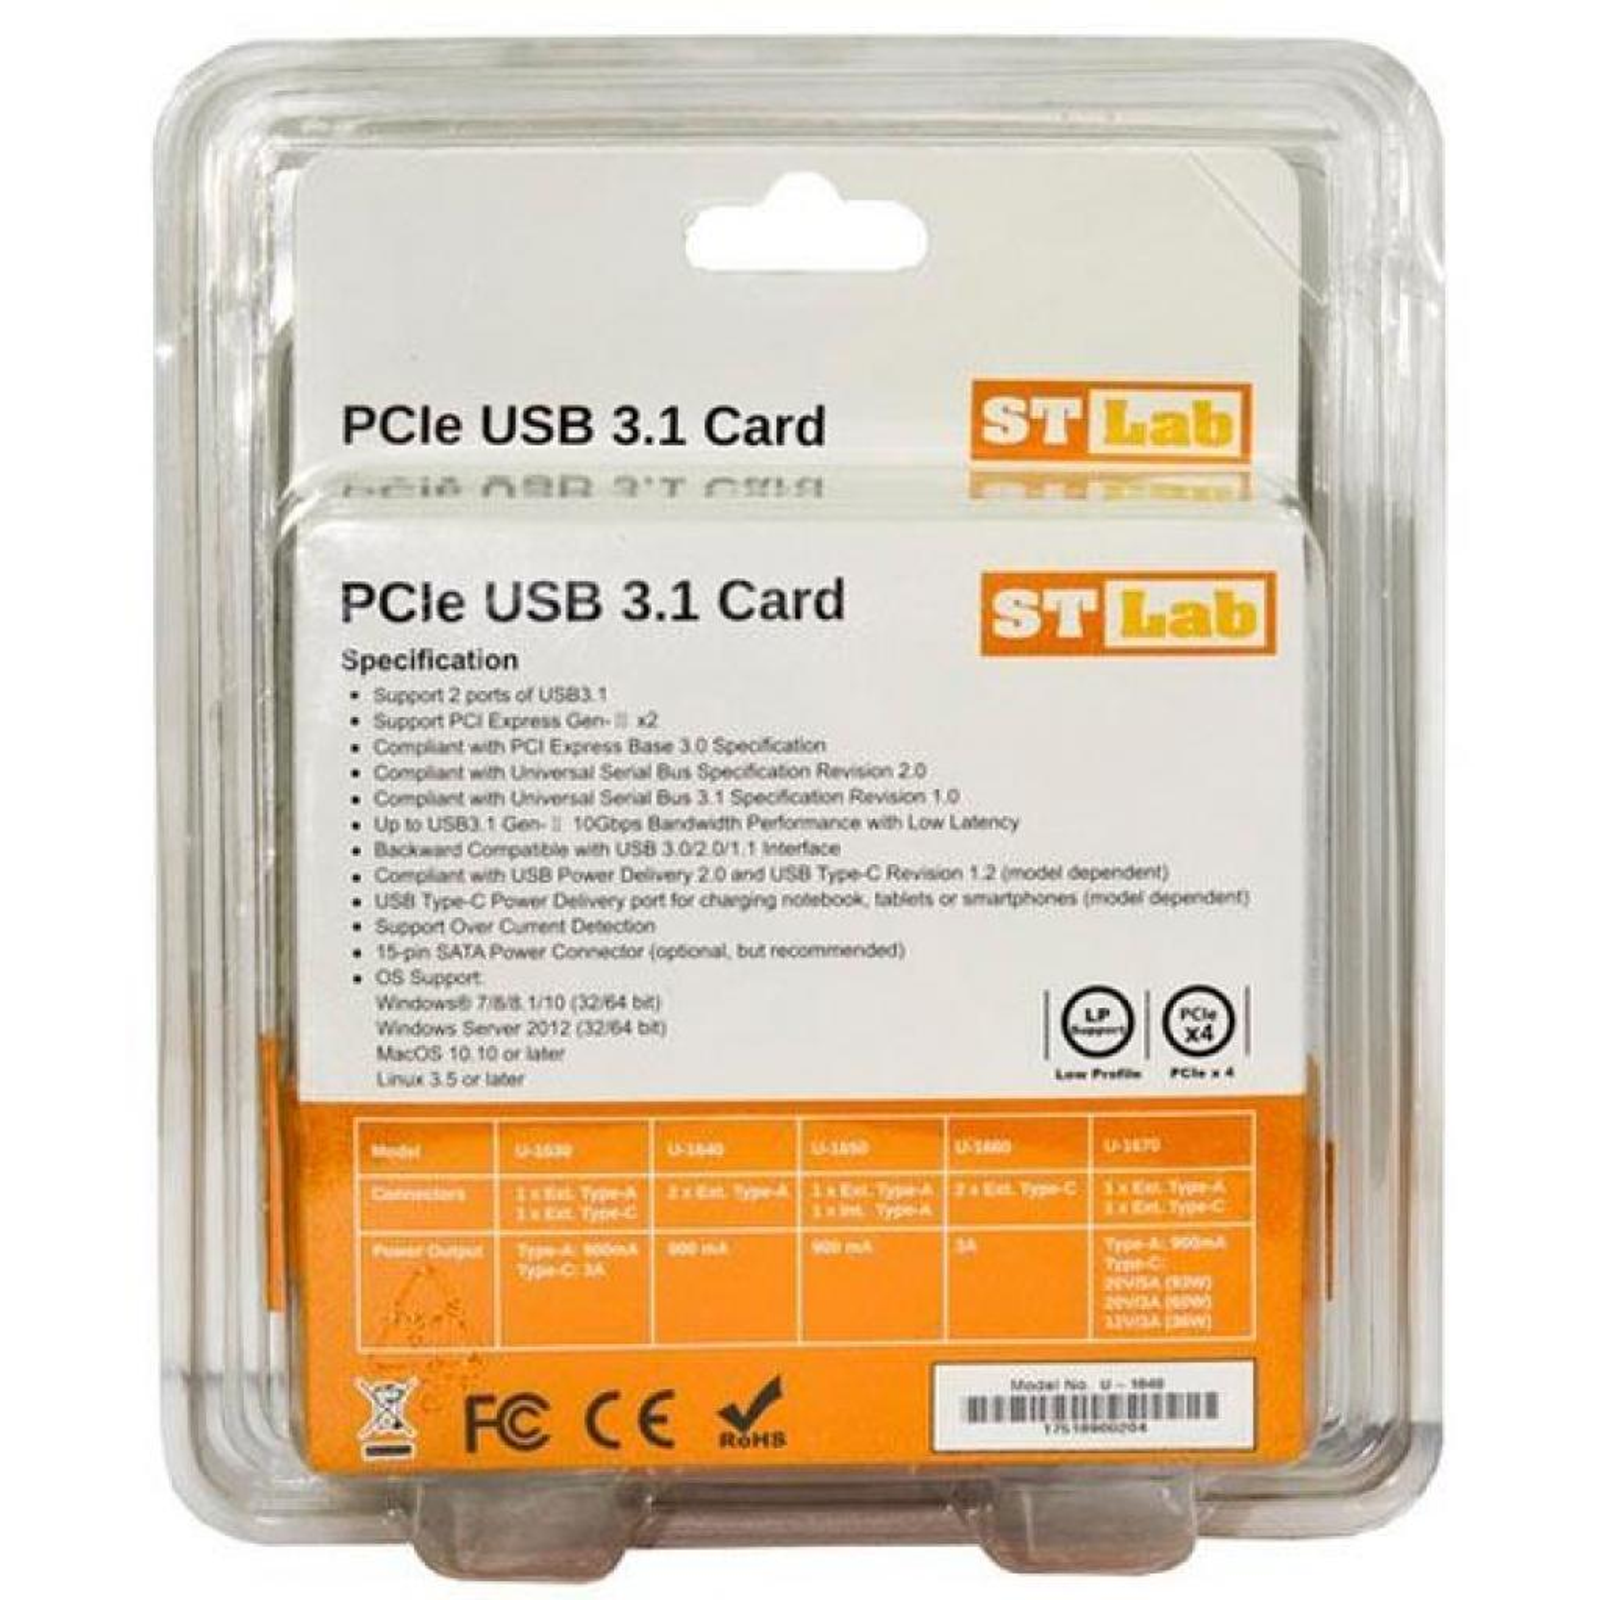 Контроллер PCI to USB3.1 Gen2 2xType-A PCI-E Gen-III x2+планка Low Prof ST-Lab (U-1640) изображение 6